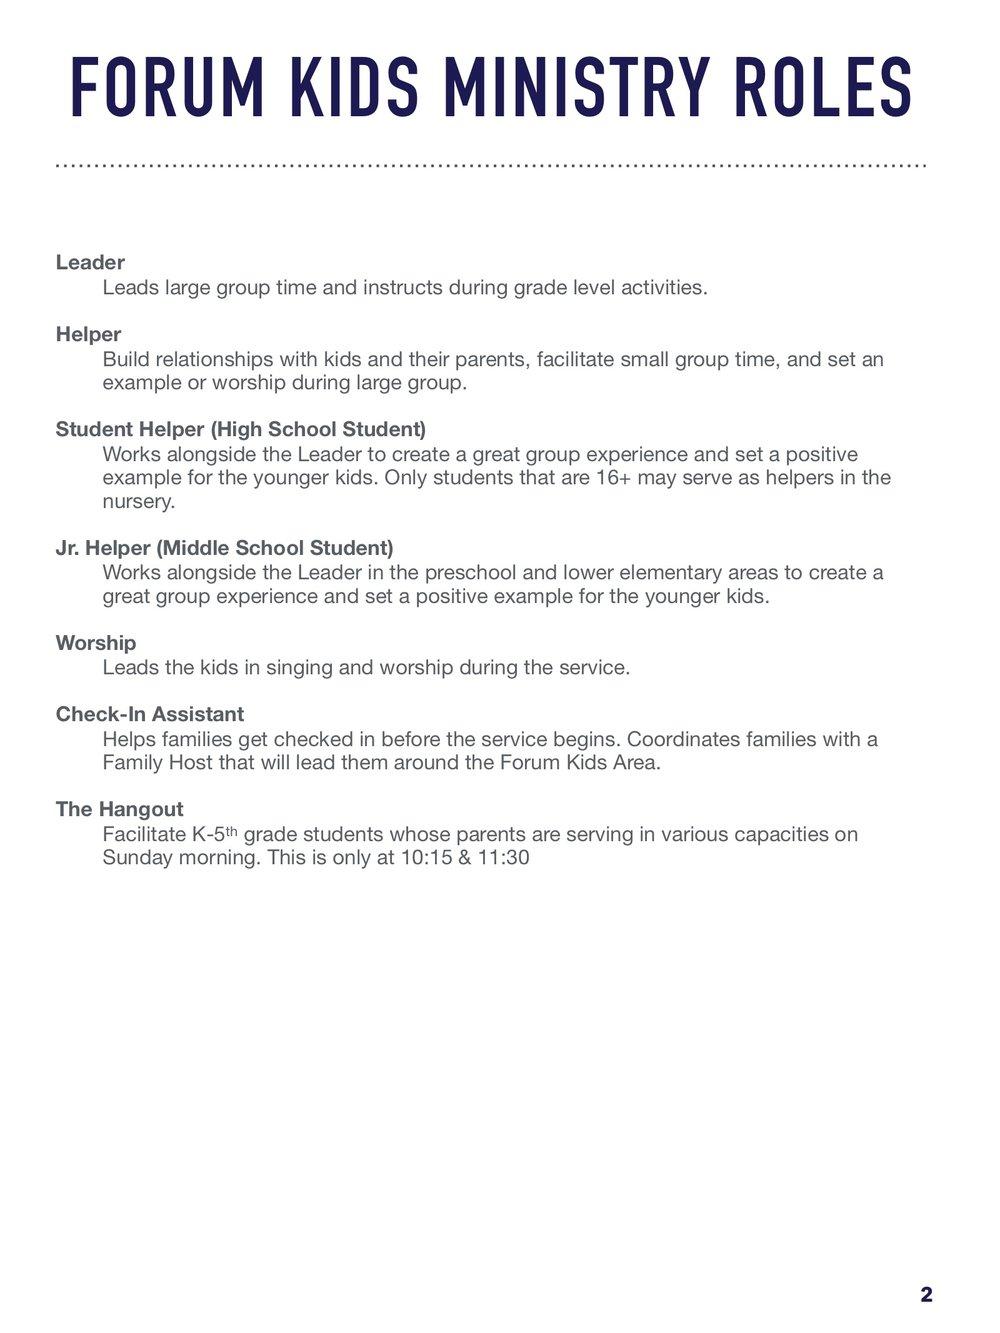 Forum Kids Policy Manual 2.jpg